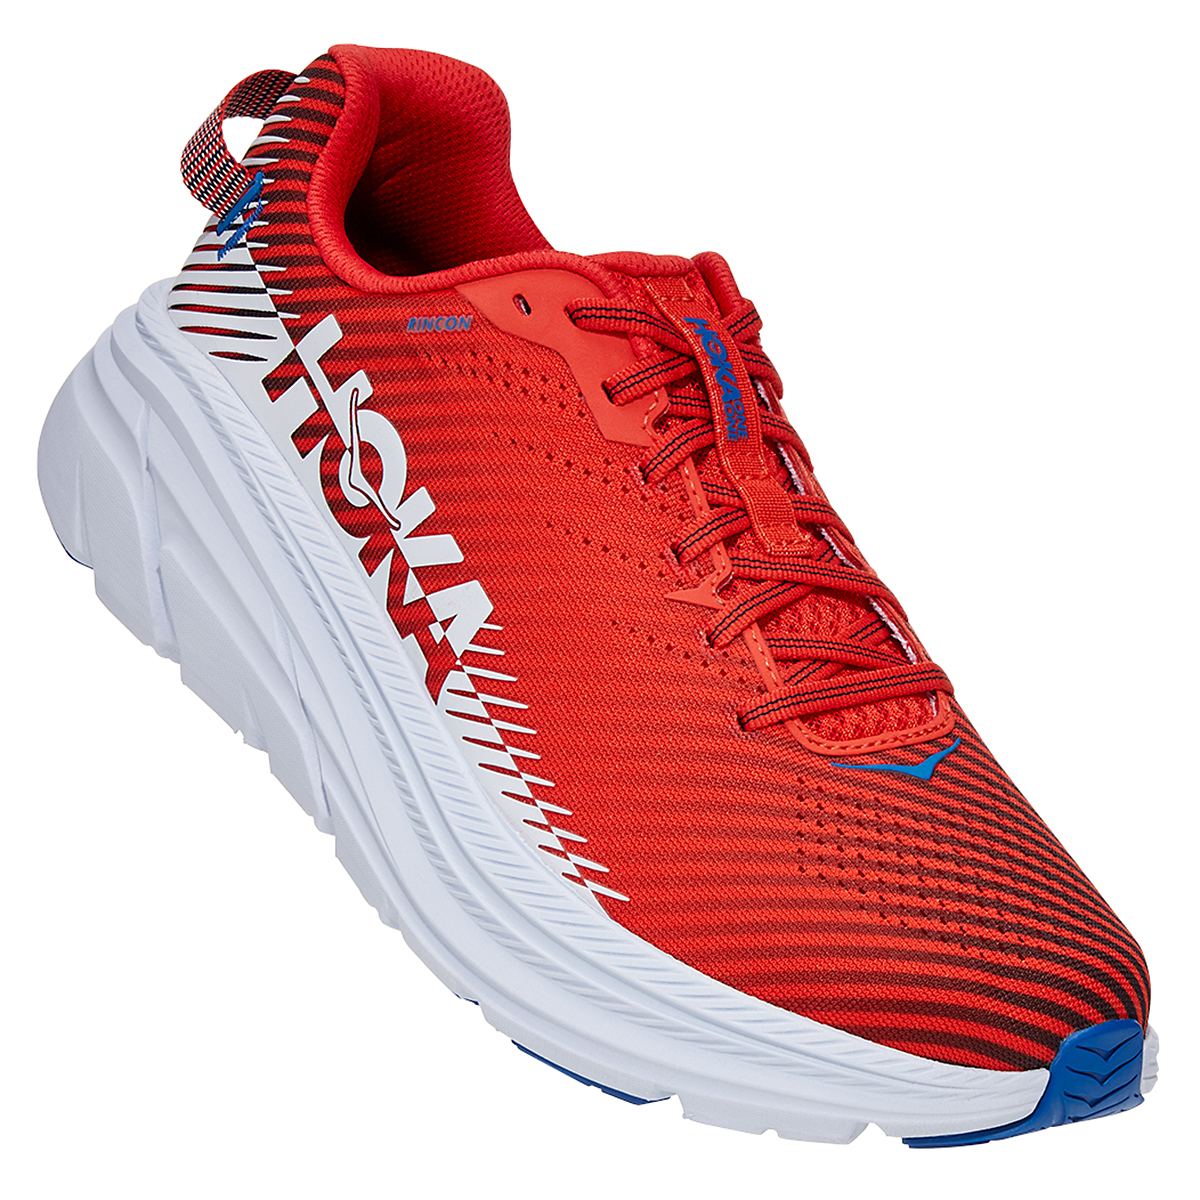 Men's Hoka One One Rincon 2 Running Shoe - Color: Fiesta/Turkish White - Size: 7 - Width: Regular, Fiesta/Turkish White, large, image 3